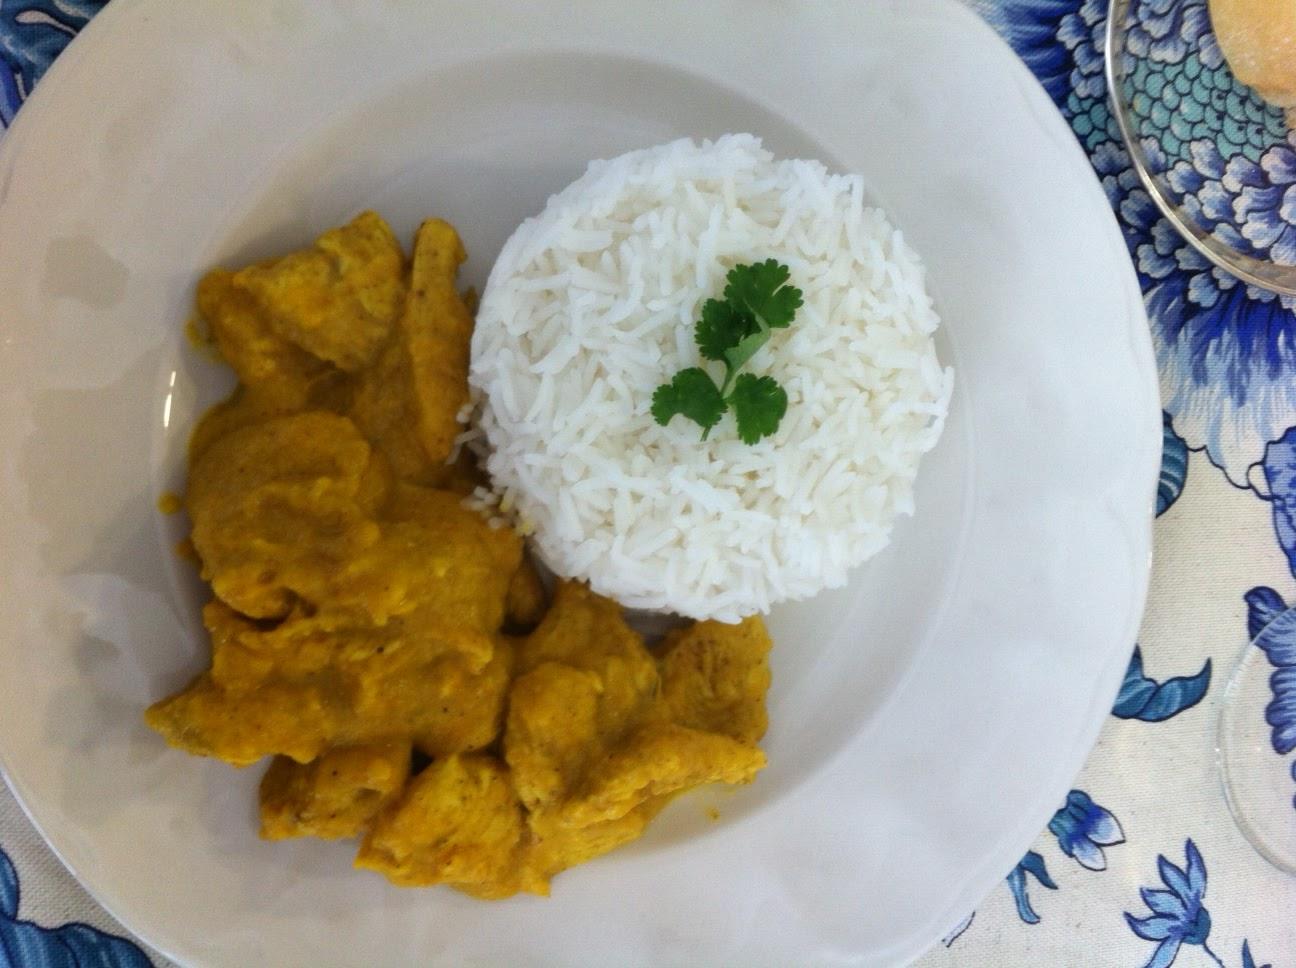 Pollo al curry con arroz basmati (Arguiñano) | Cocina como en casa